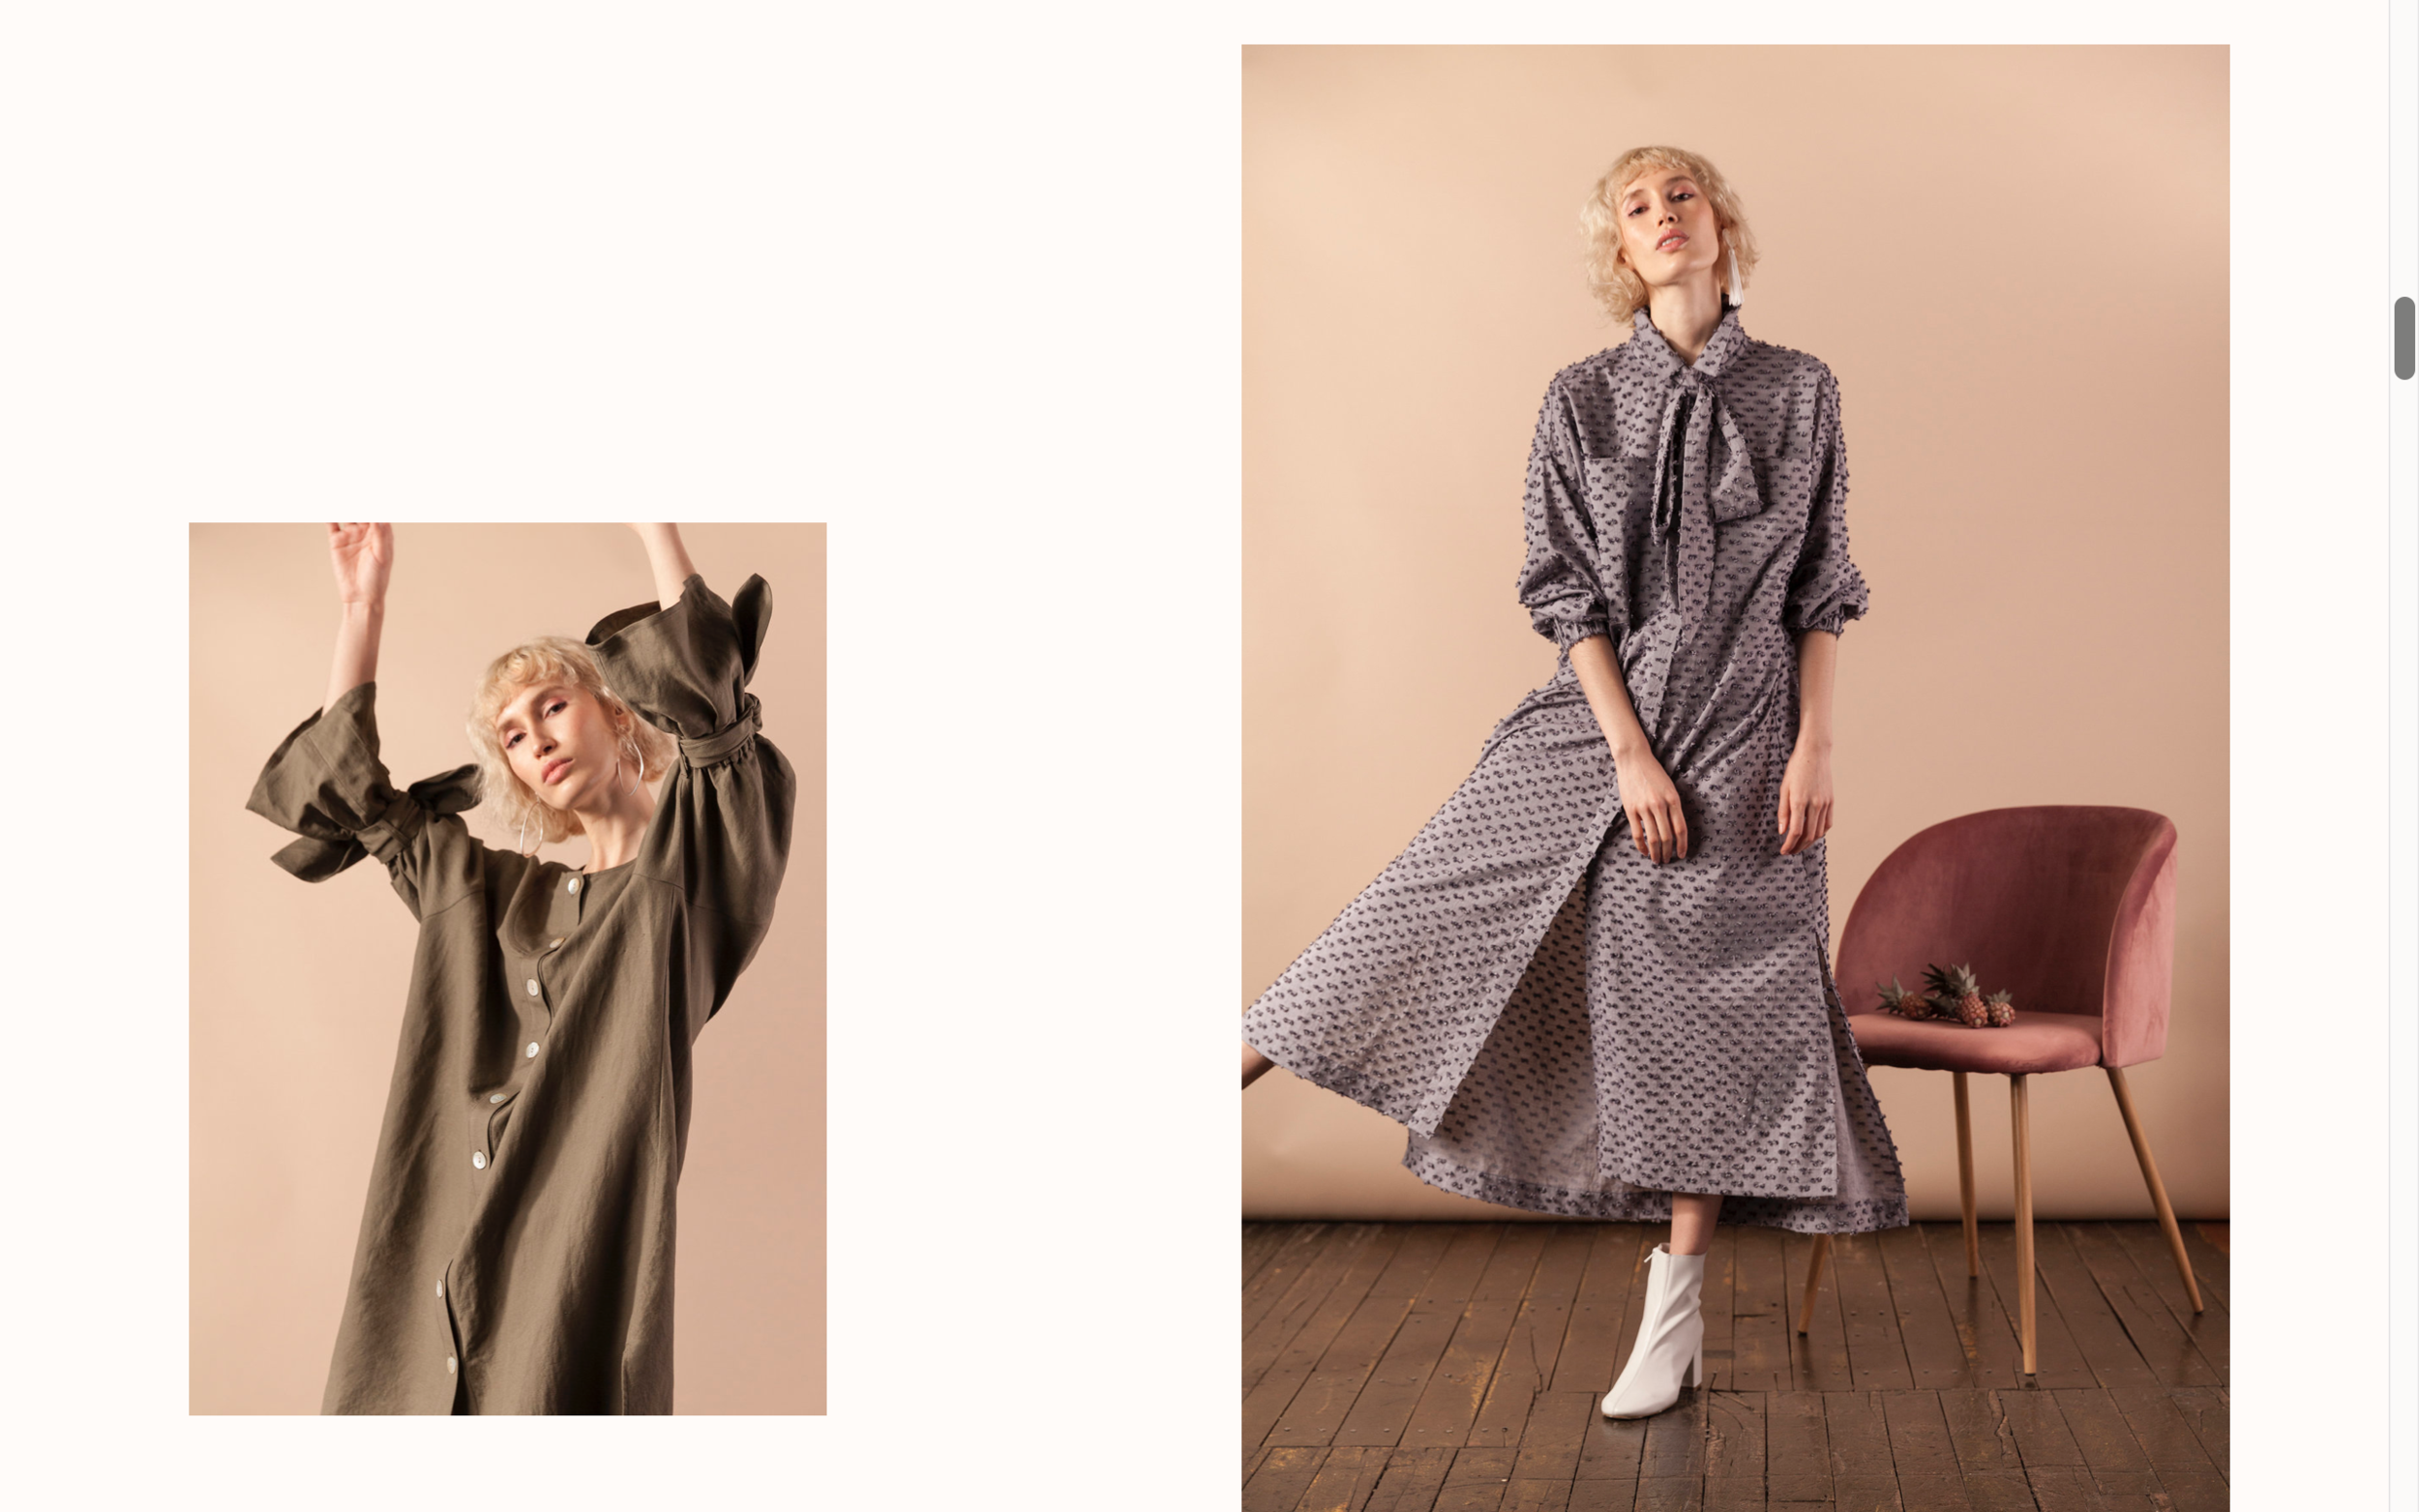 House-Dress-Ny-Lookbook-Sleeve-Caftan-Garmentory